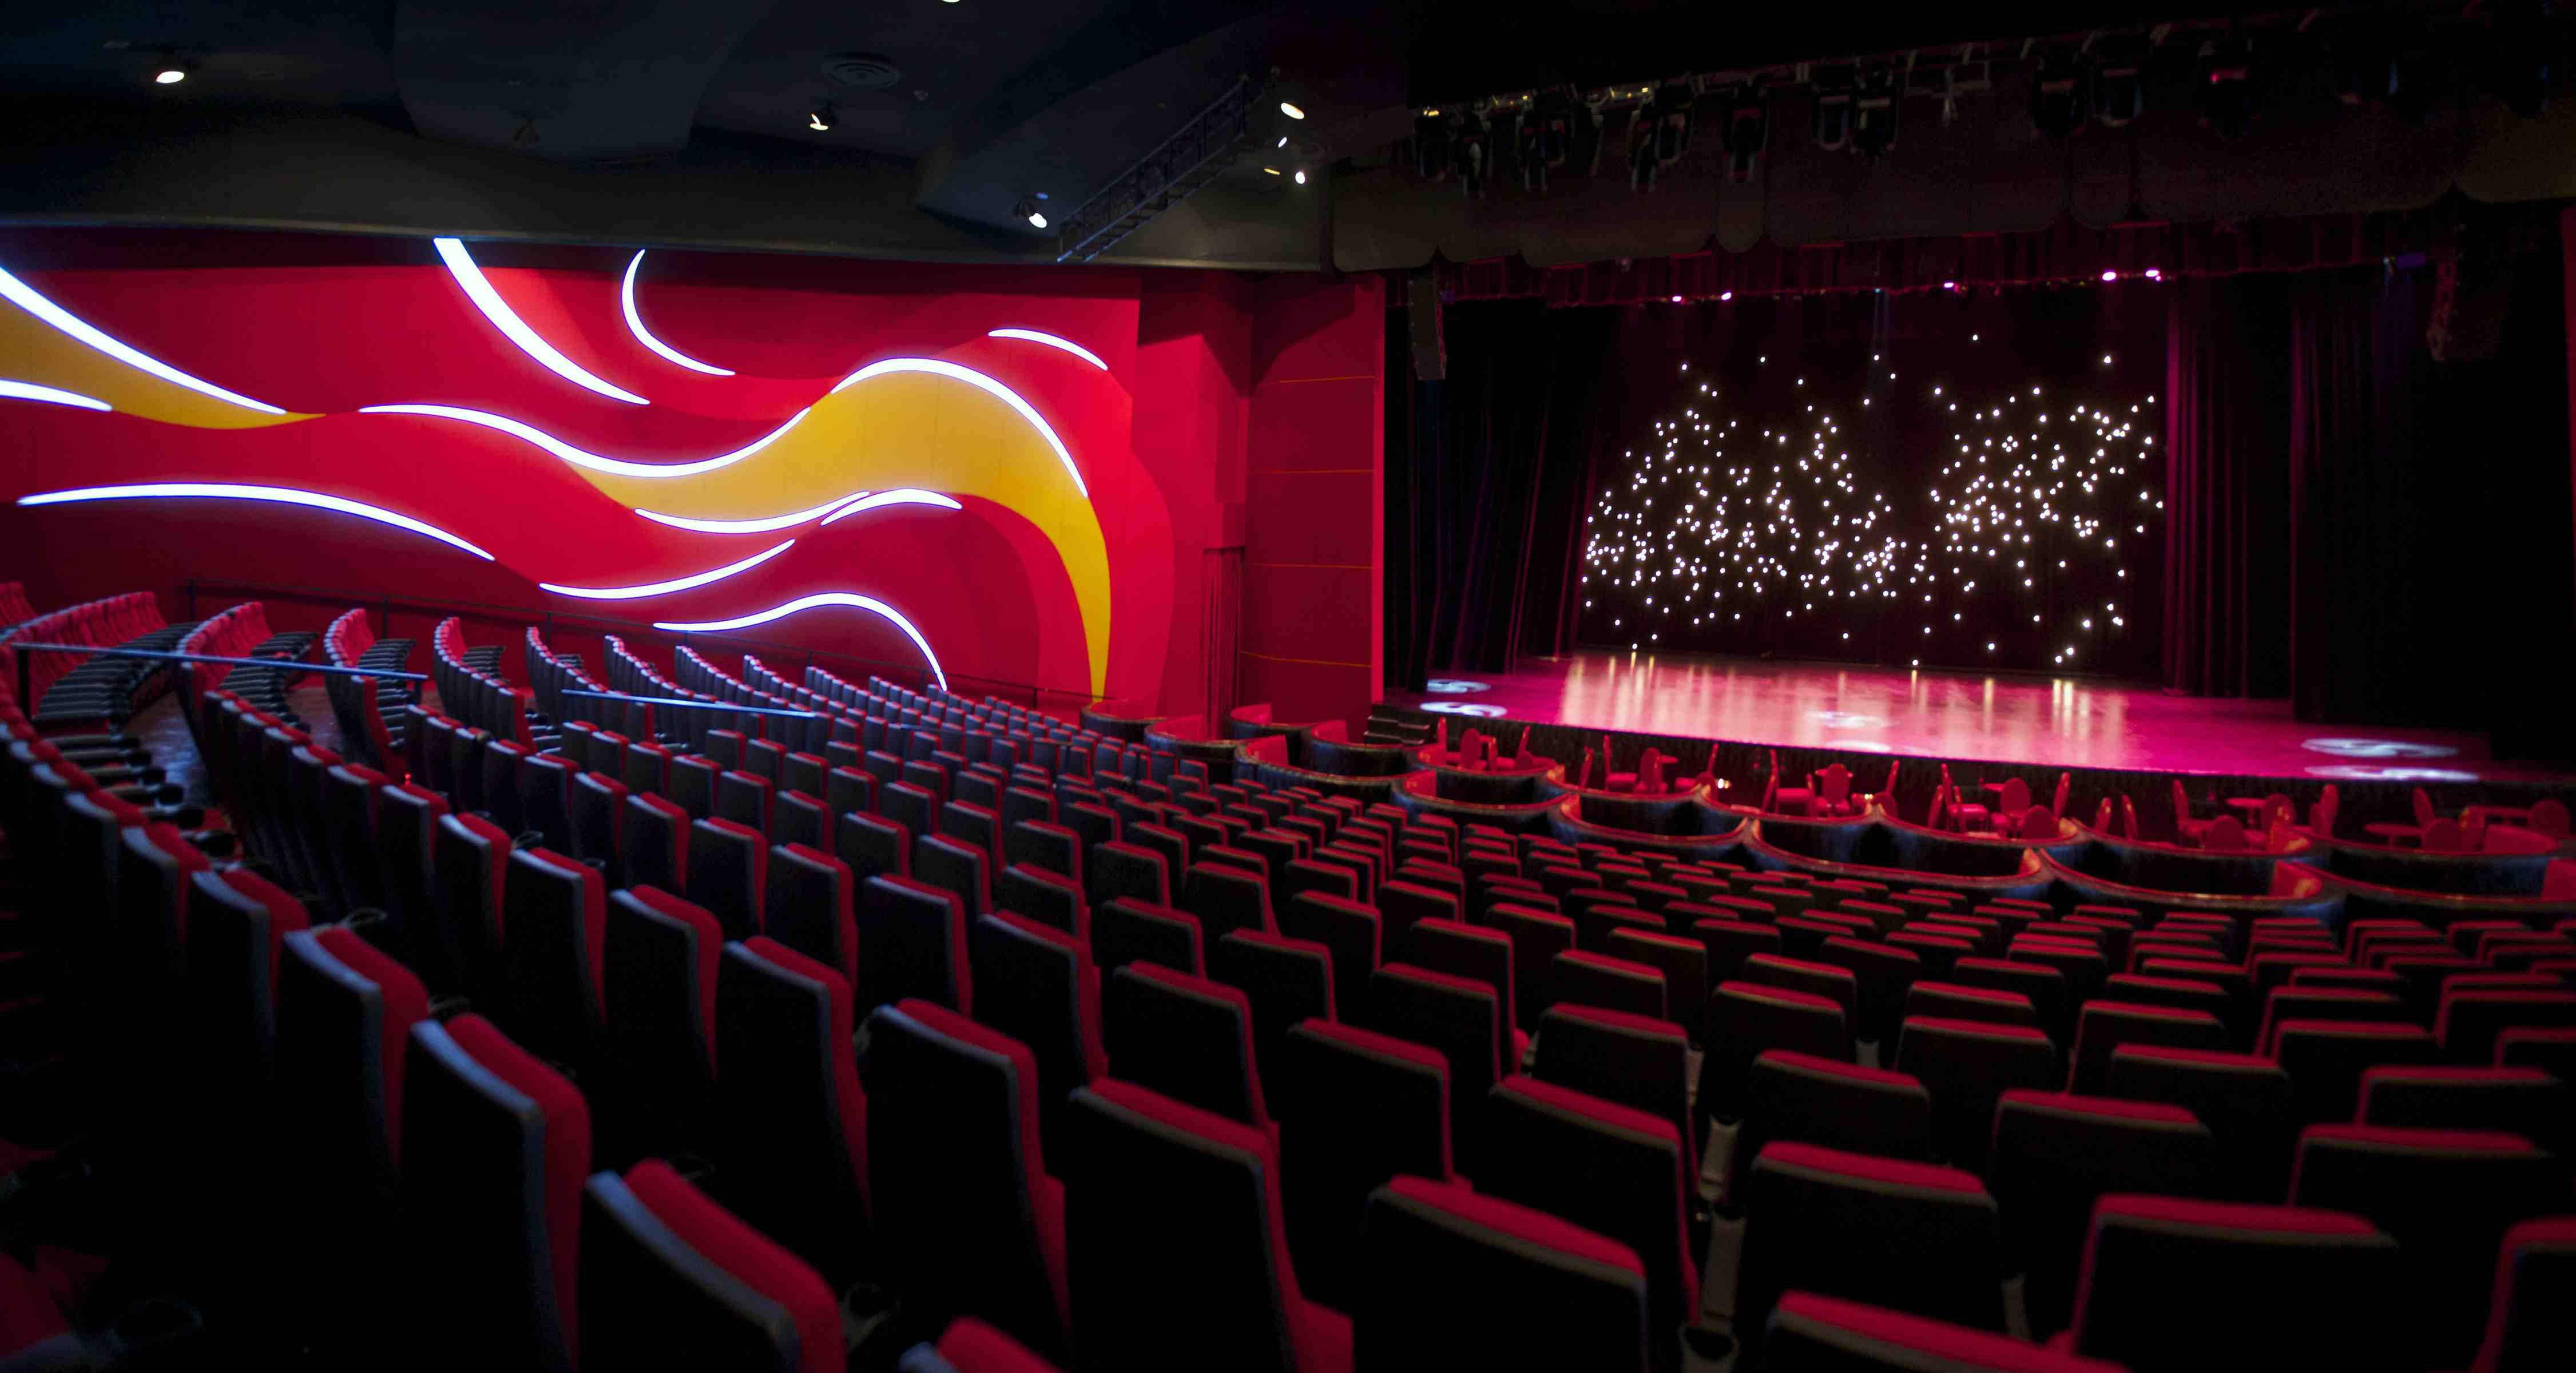 Terry fator theater las vegas : 55 led vizio smart tv